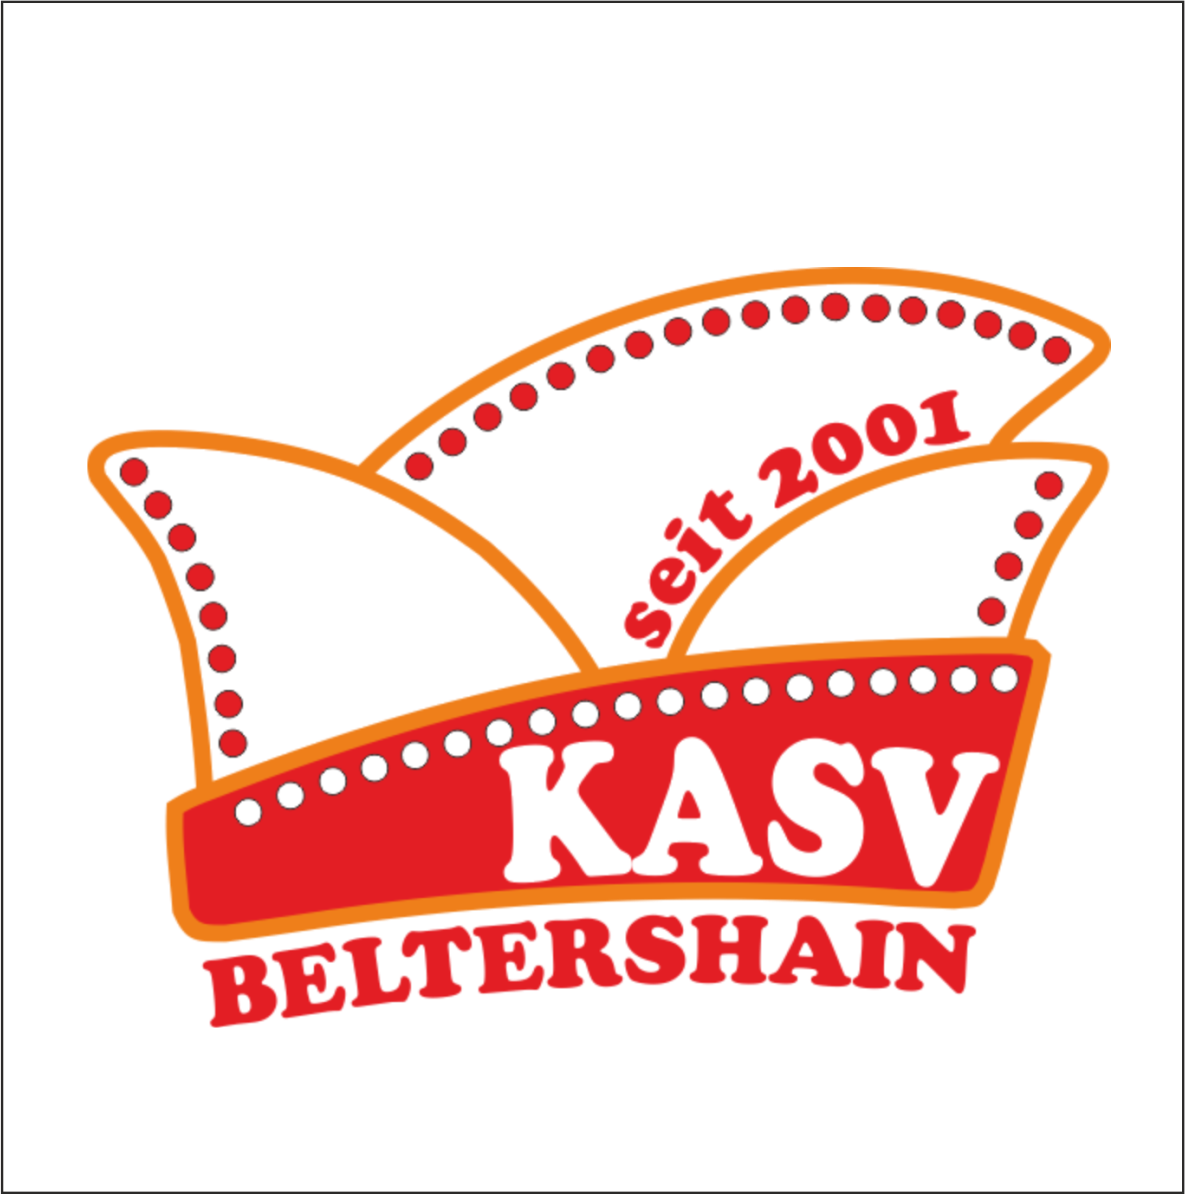 KASV Beltershain